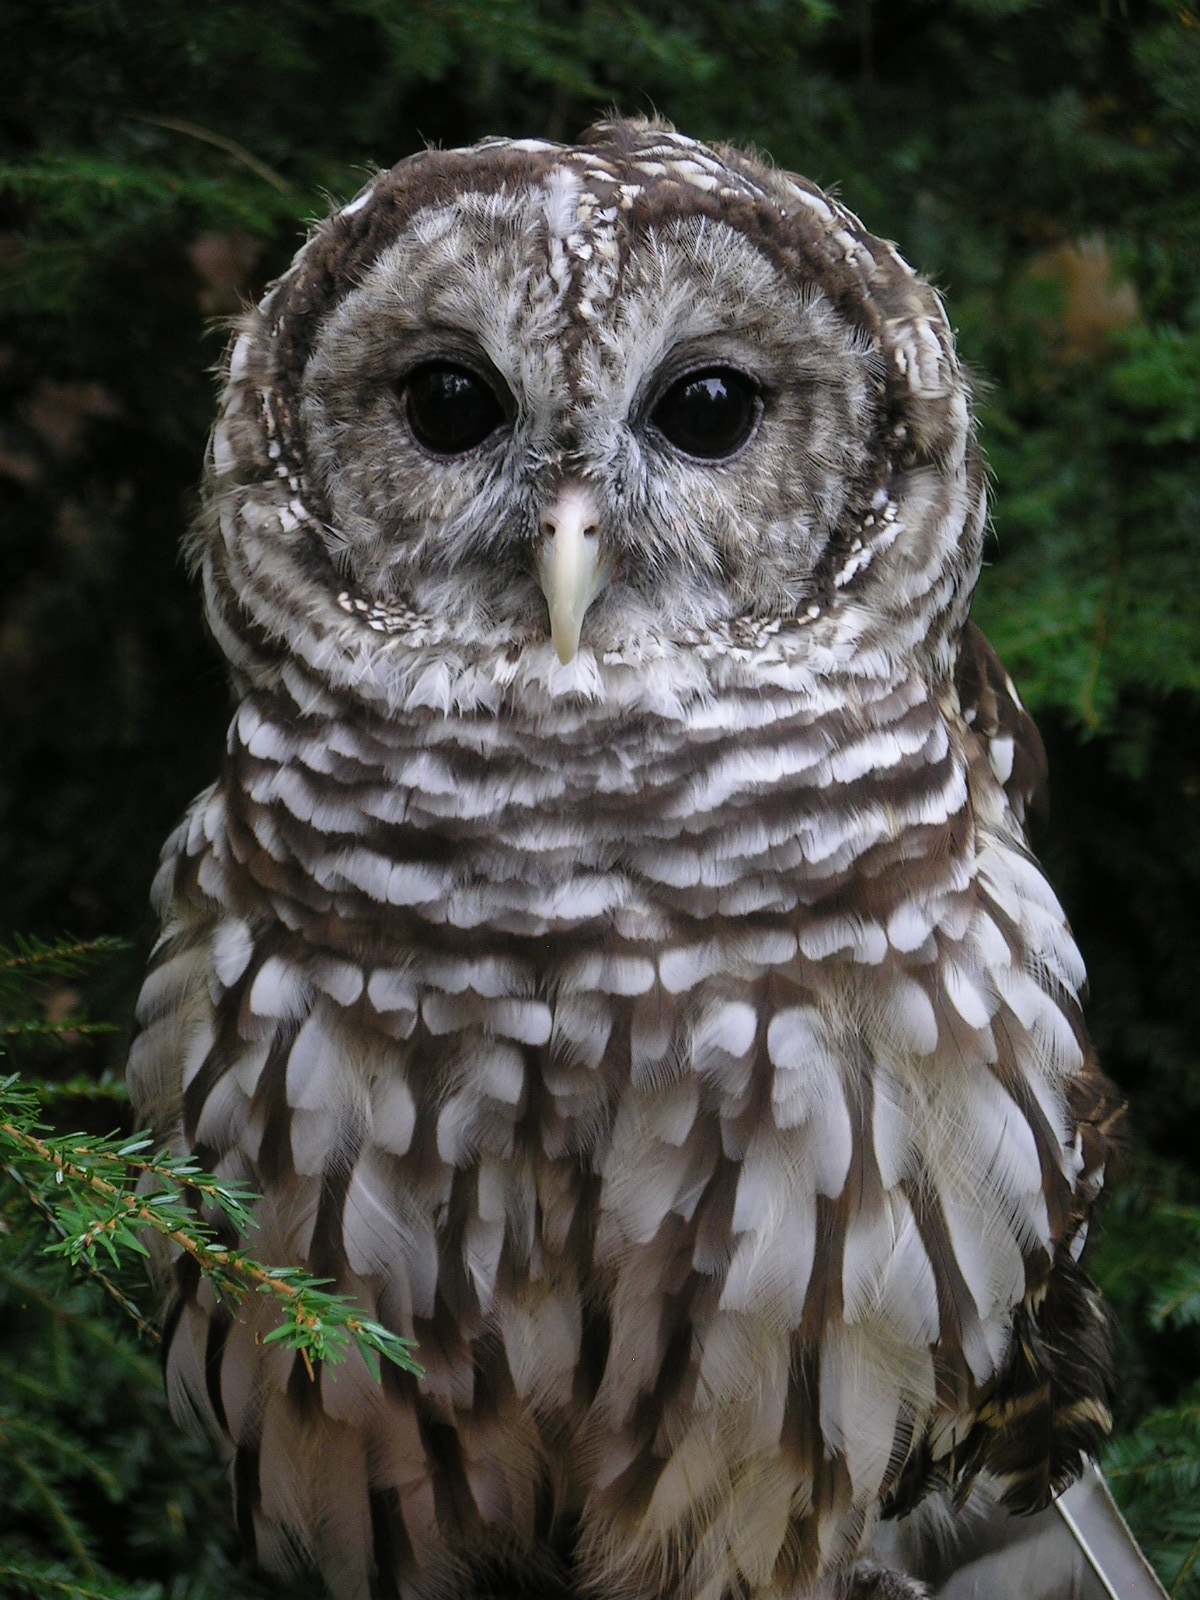 Artemis the owl